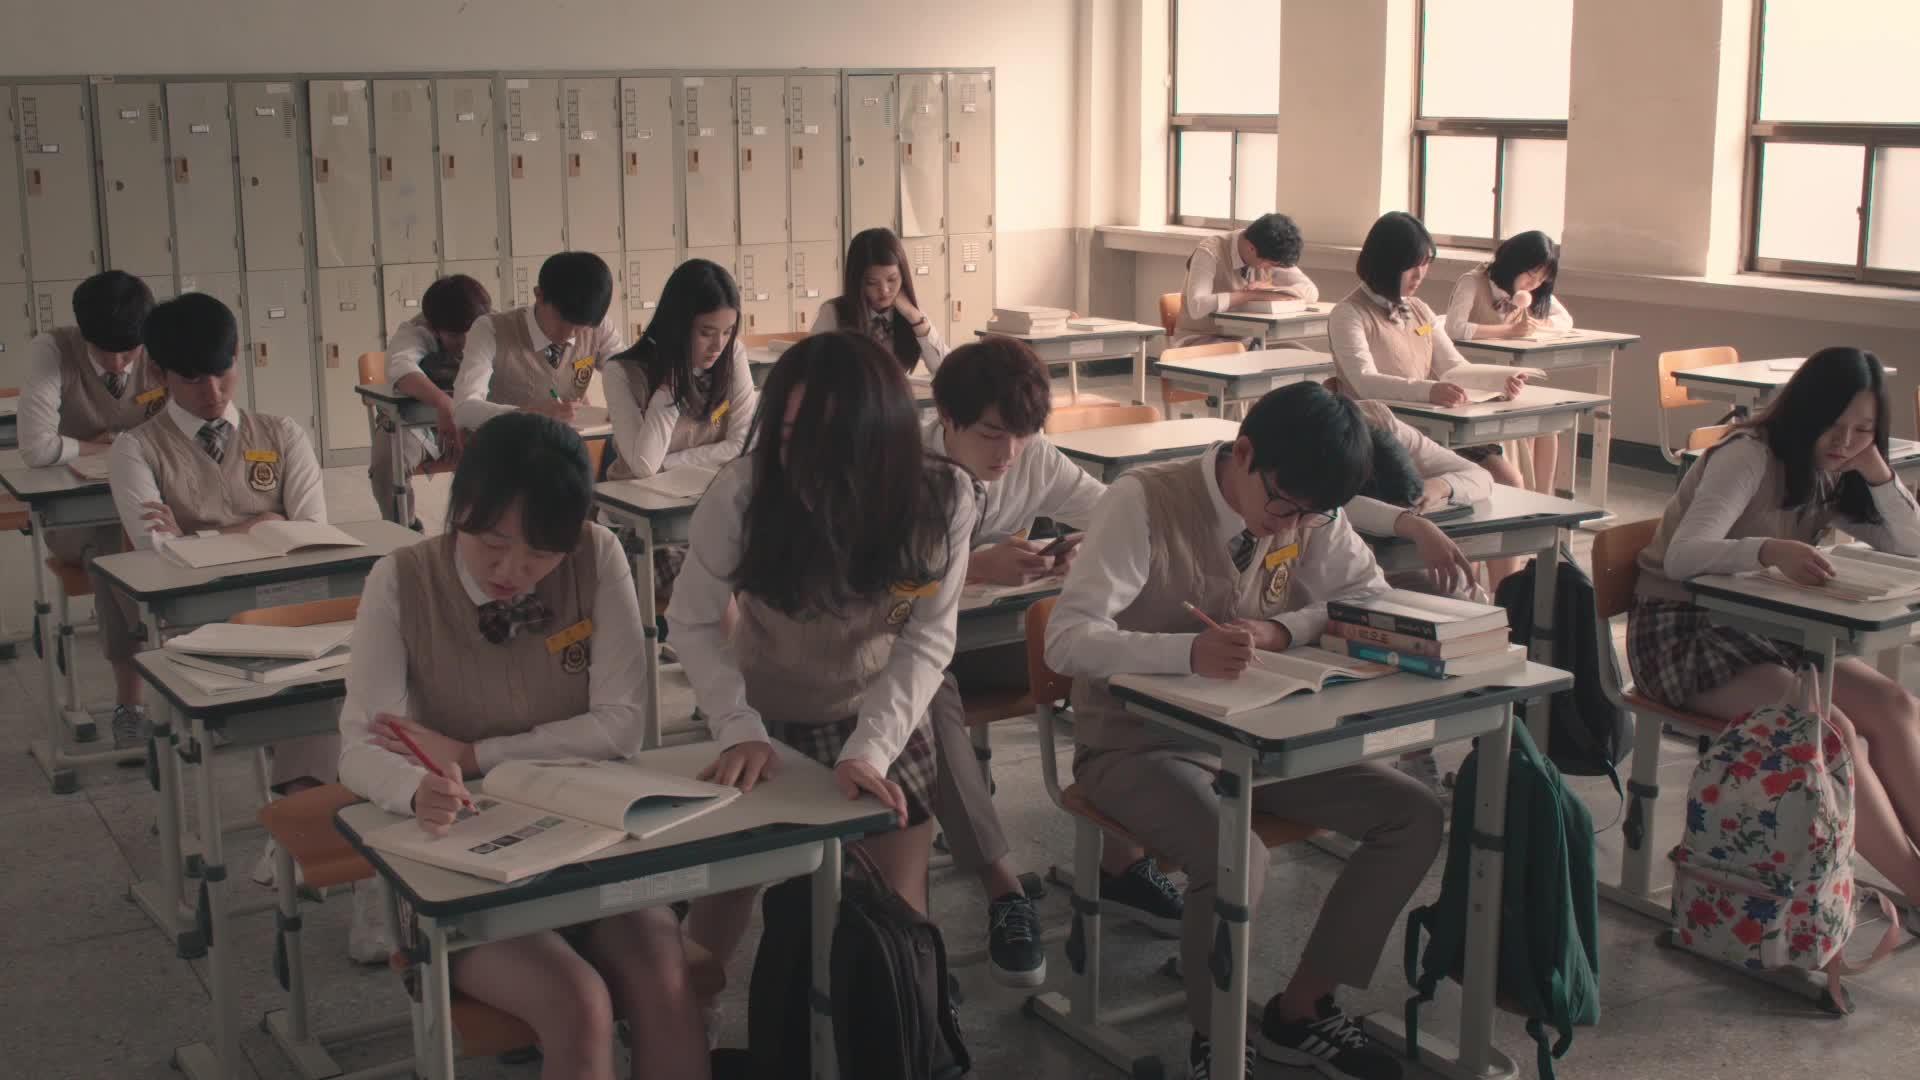 Trailer 1: Professor de Pesadelos